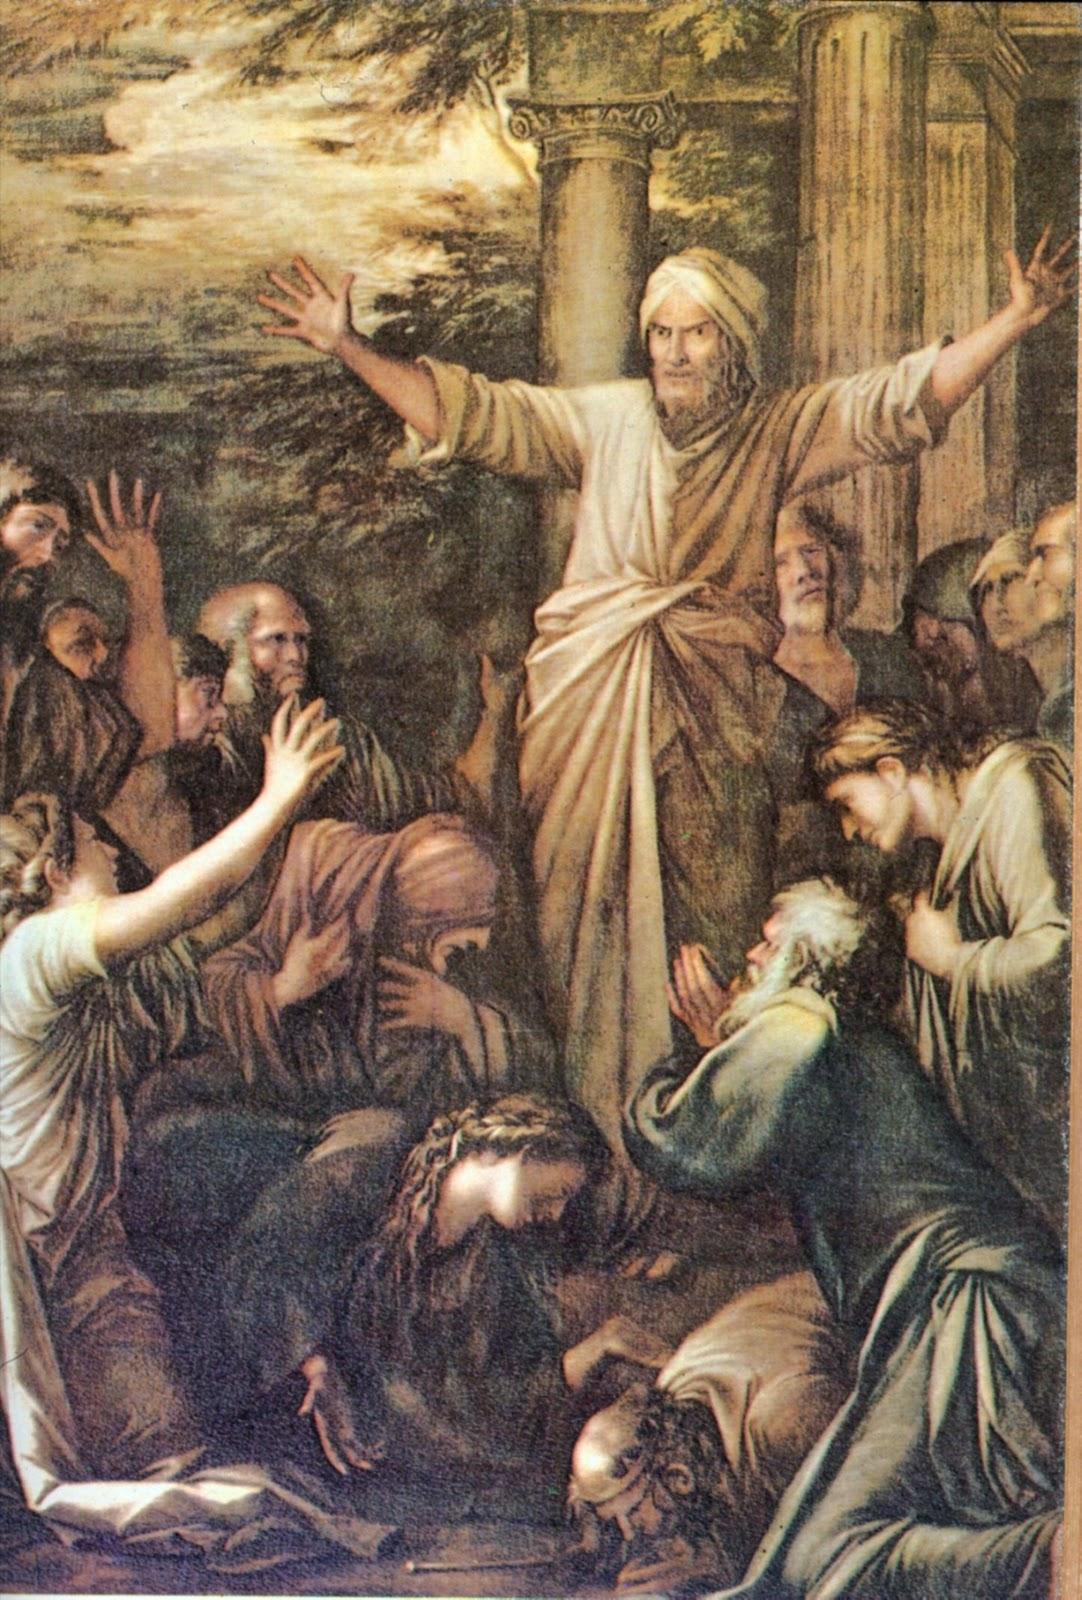 Third Sunday of Ordinary Time: Jon 3:1-5, 10; Ps 25:4-9; 1 ...